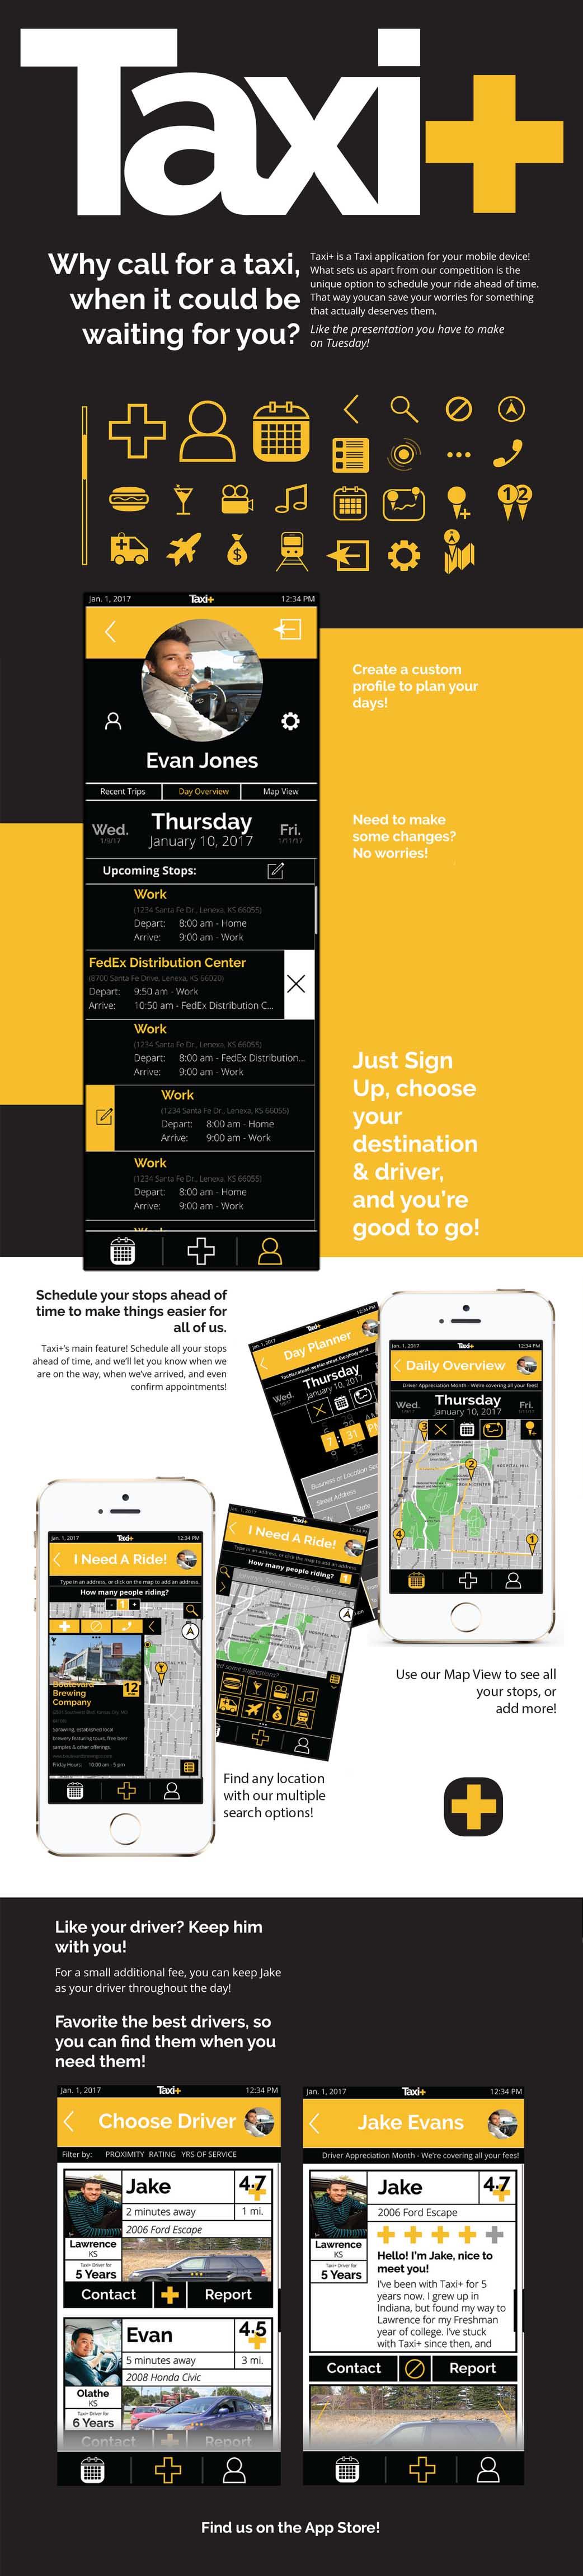 taxi_behance-copy_resize